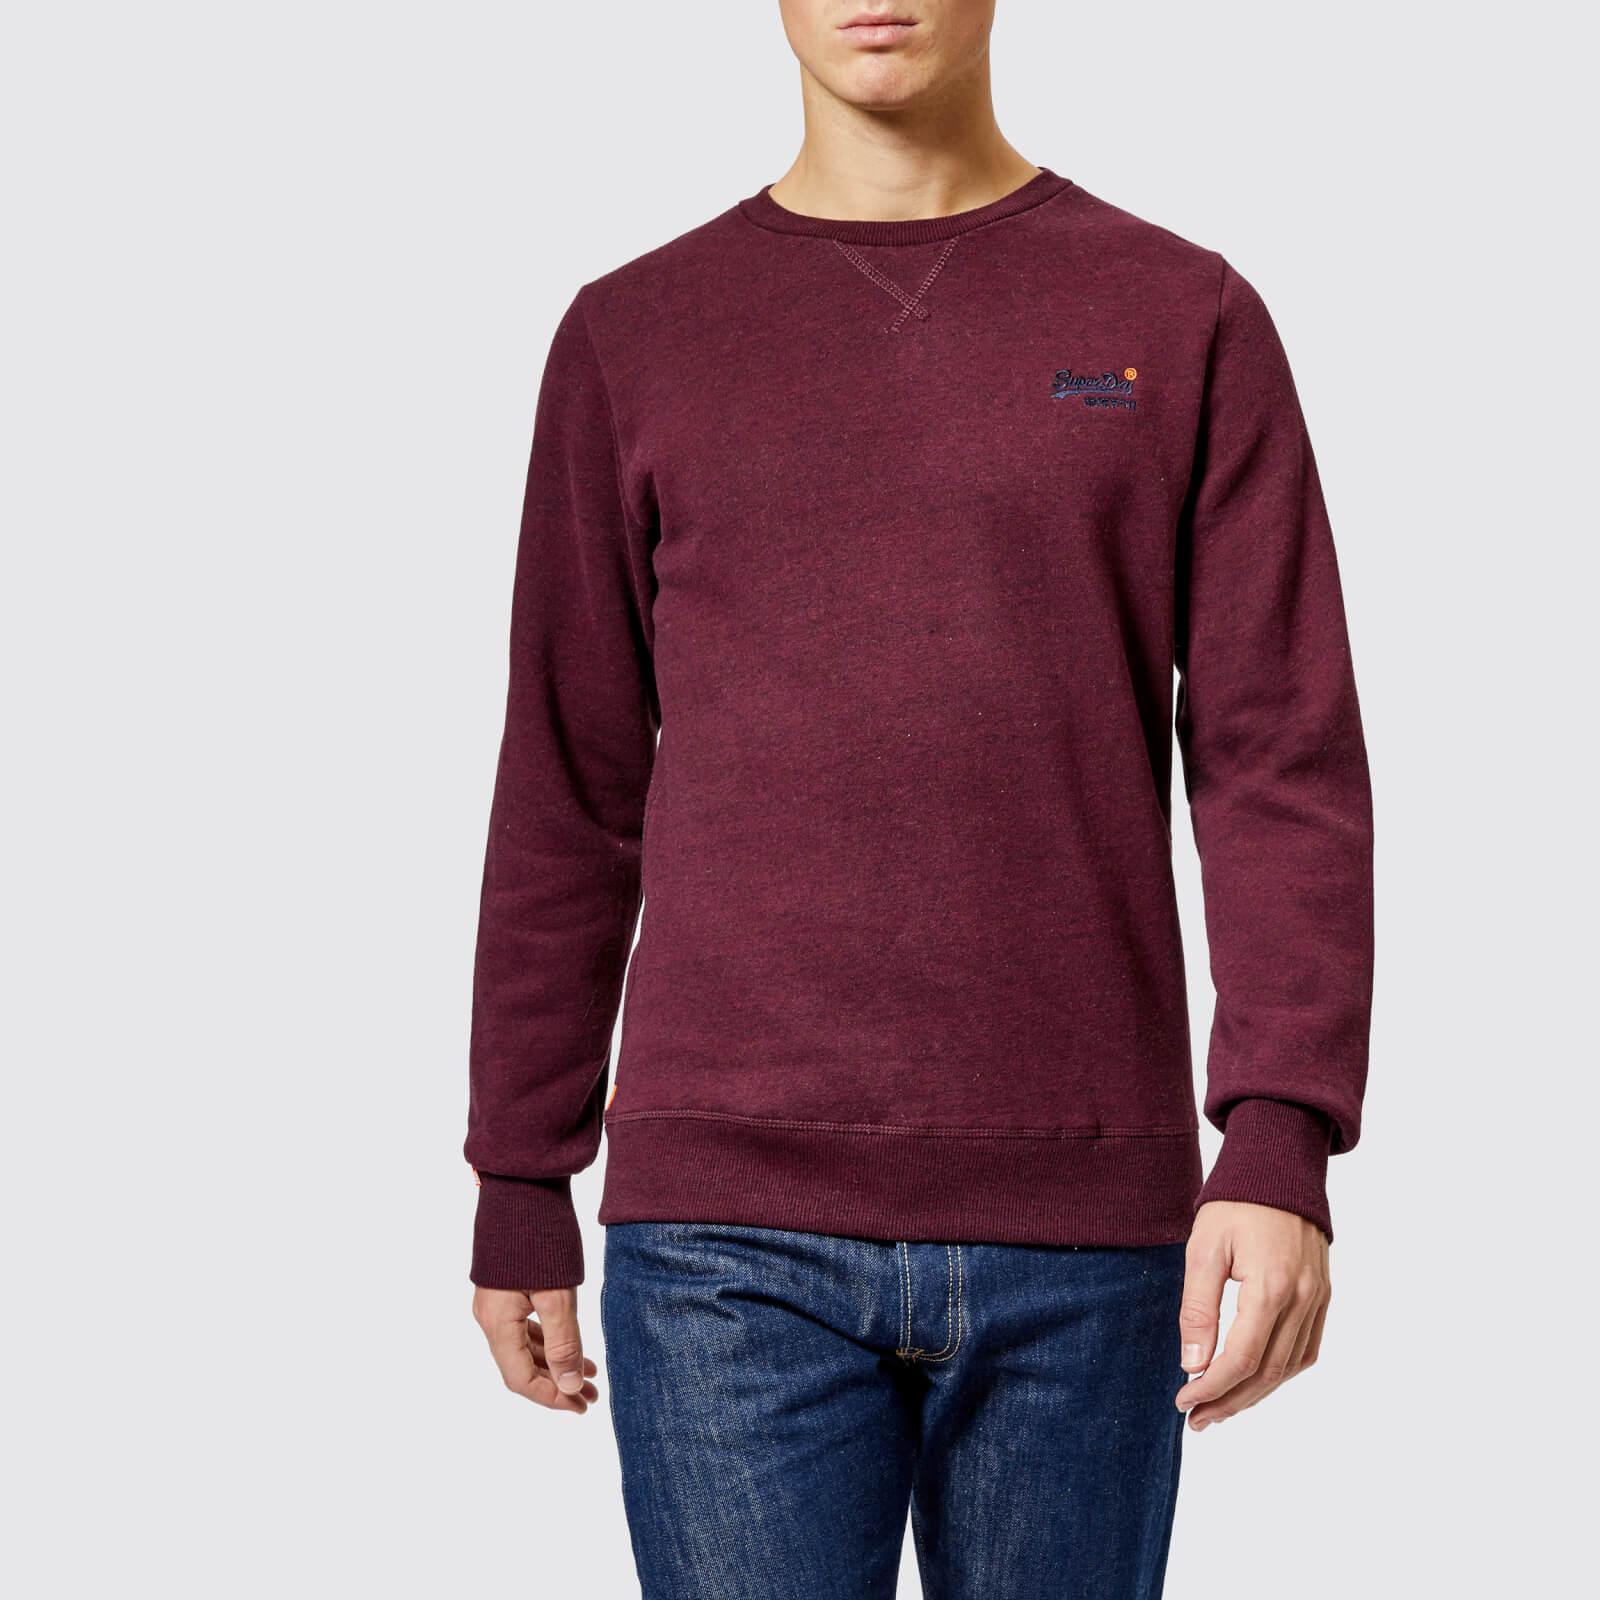 XXXL S Superdry Orange Label Sweatshirt Crew Neck Boston Burgundy Grit Sizes